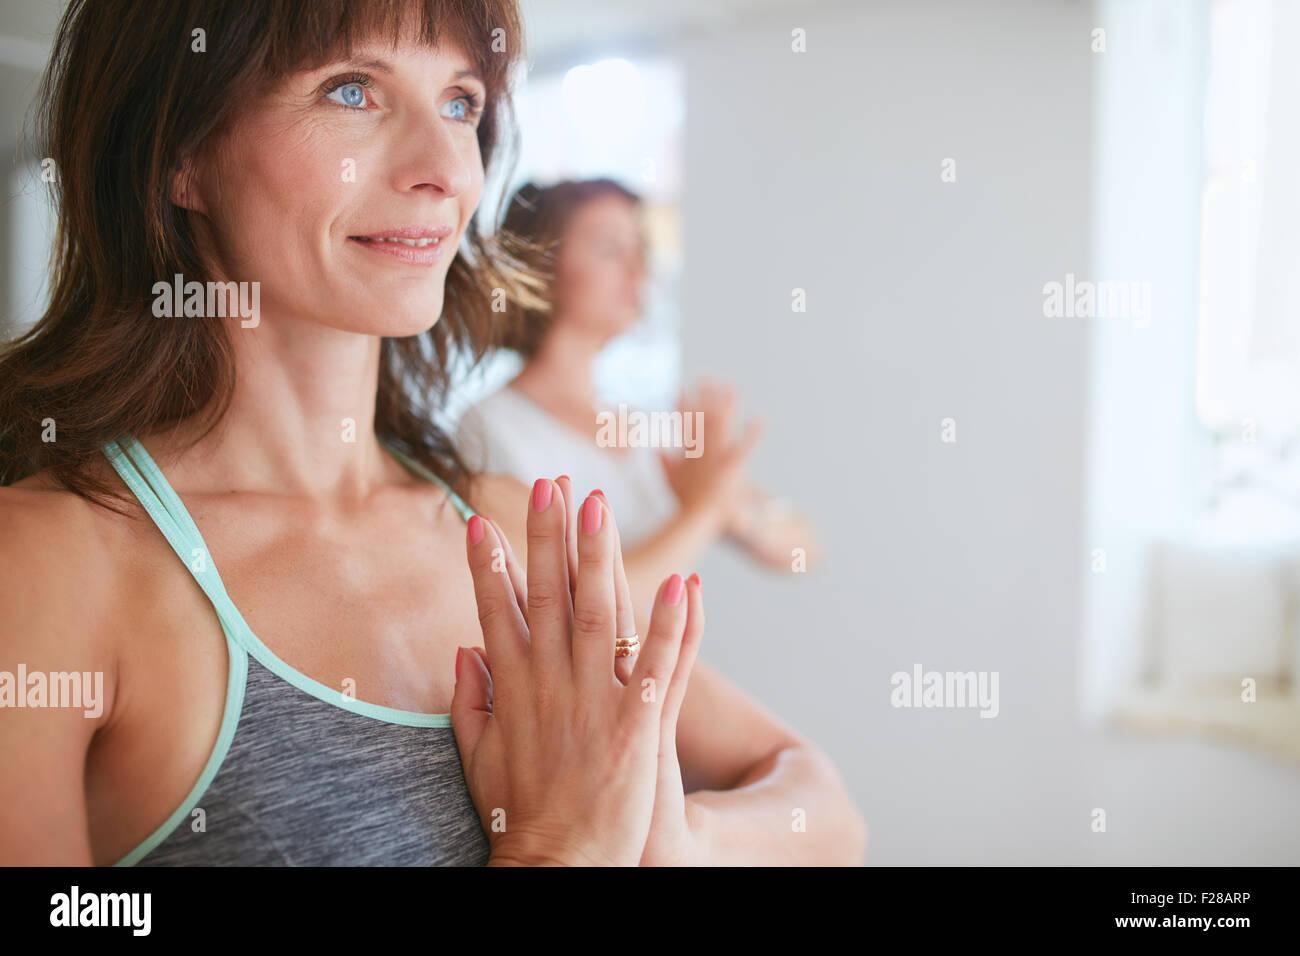 Close up shot of happy mature woman doing yoga looking away smiling. Women in yoga pose vrikshasana using Namaste. - Stock Image